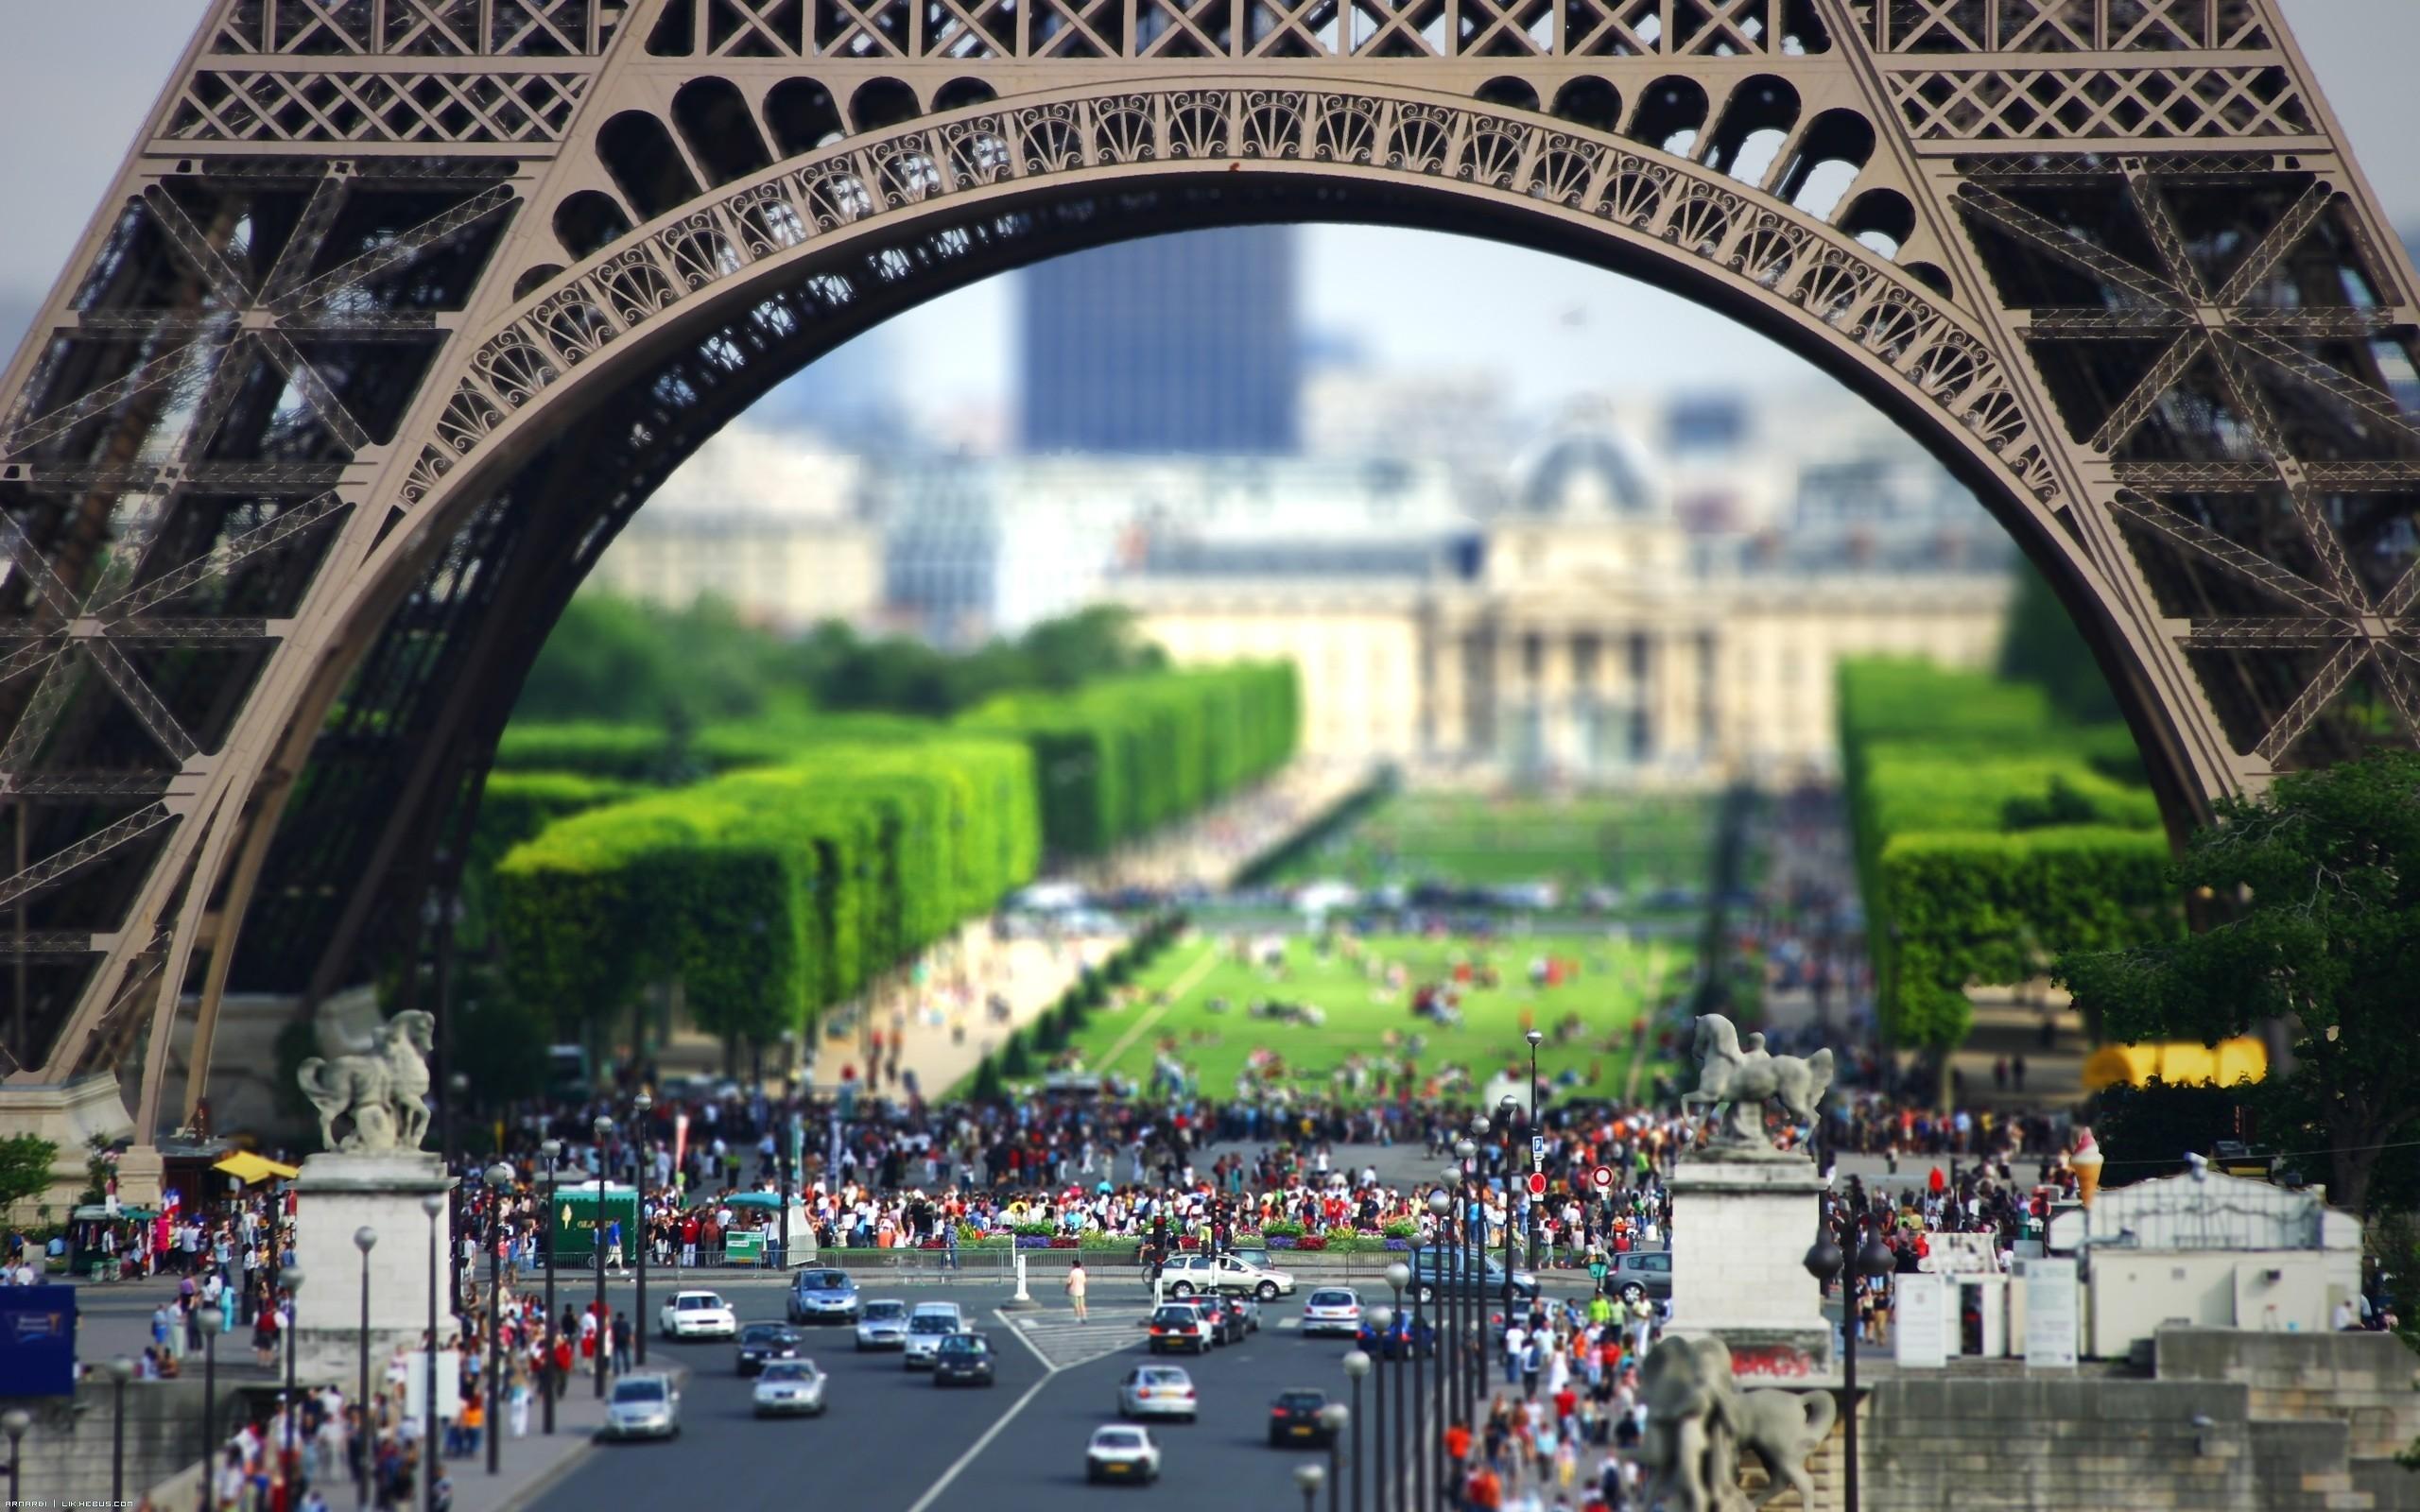 Eiffeltower Tilt Shift Effekt